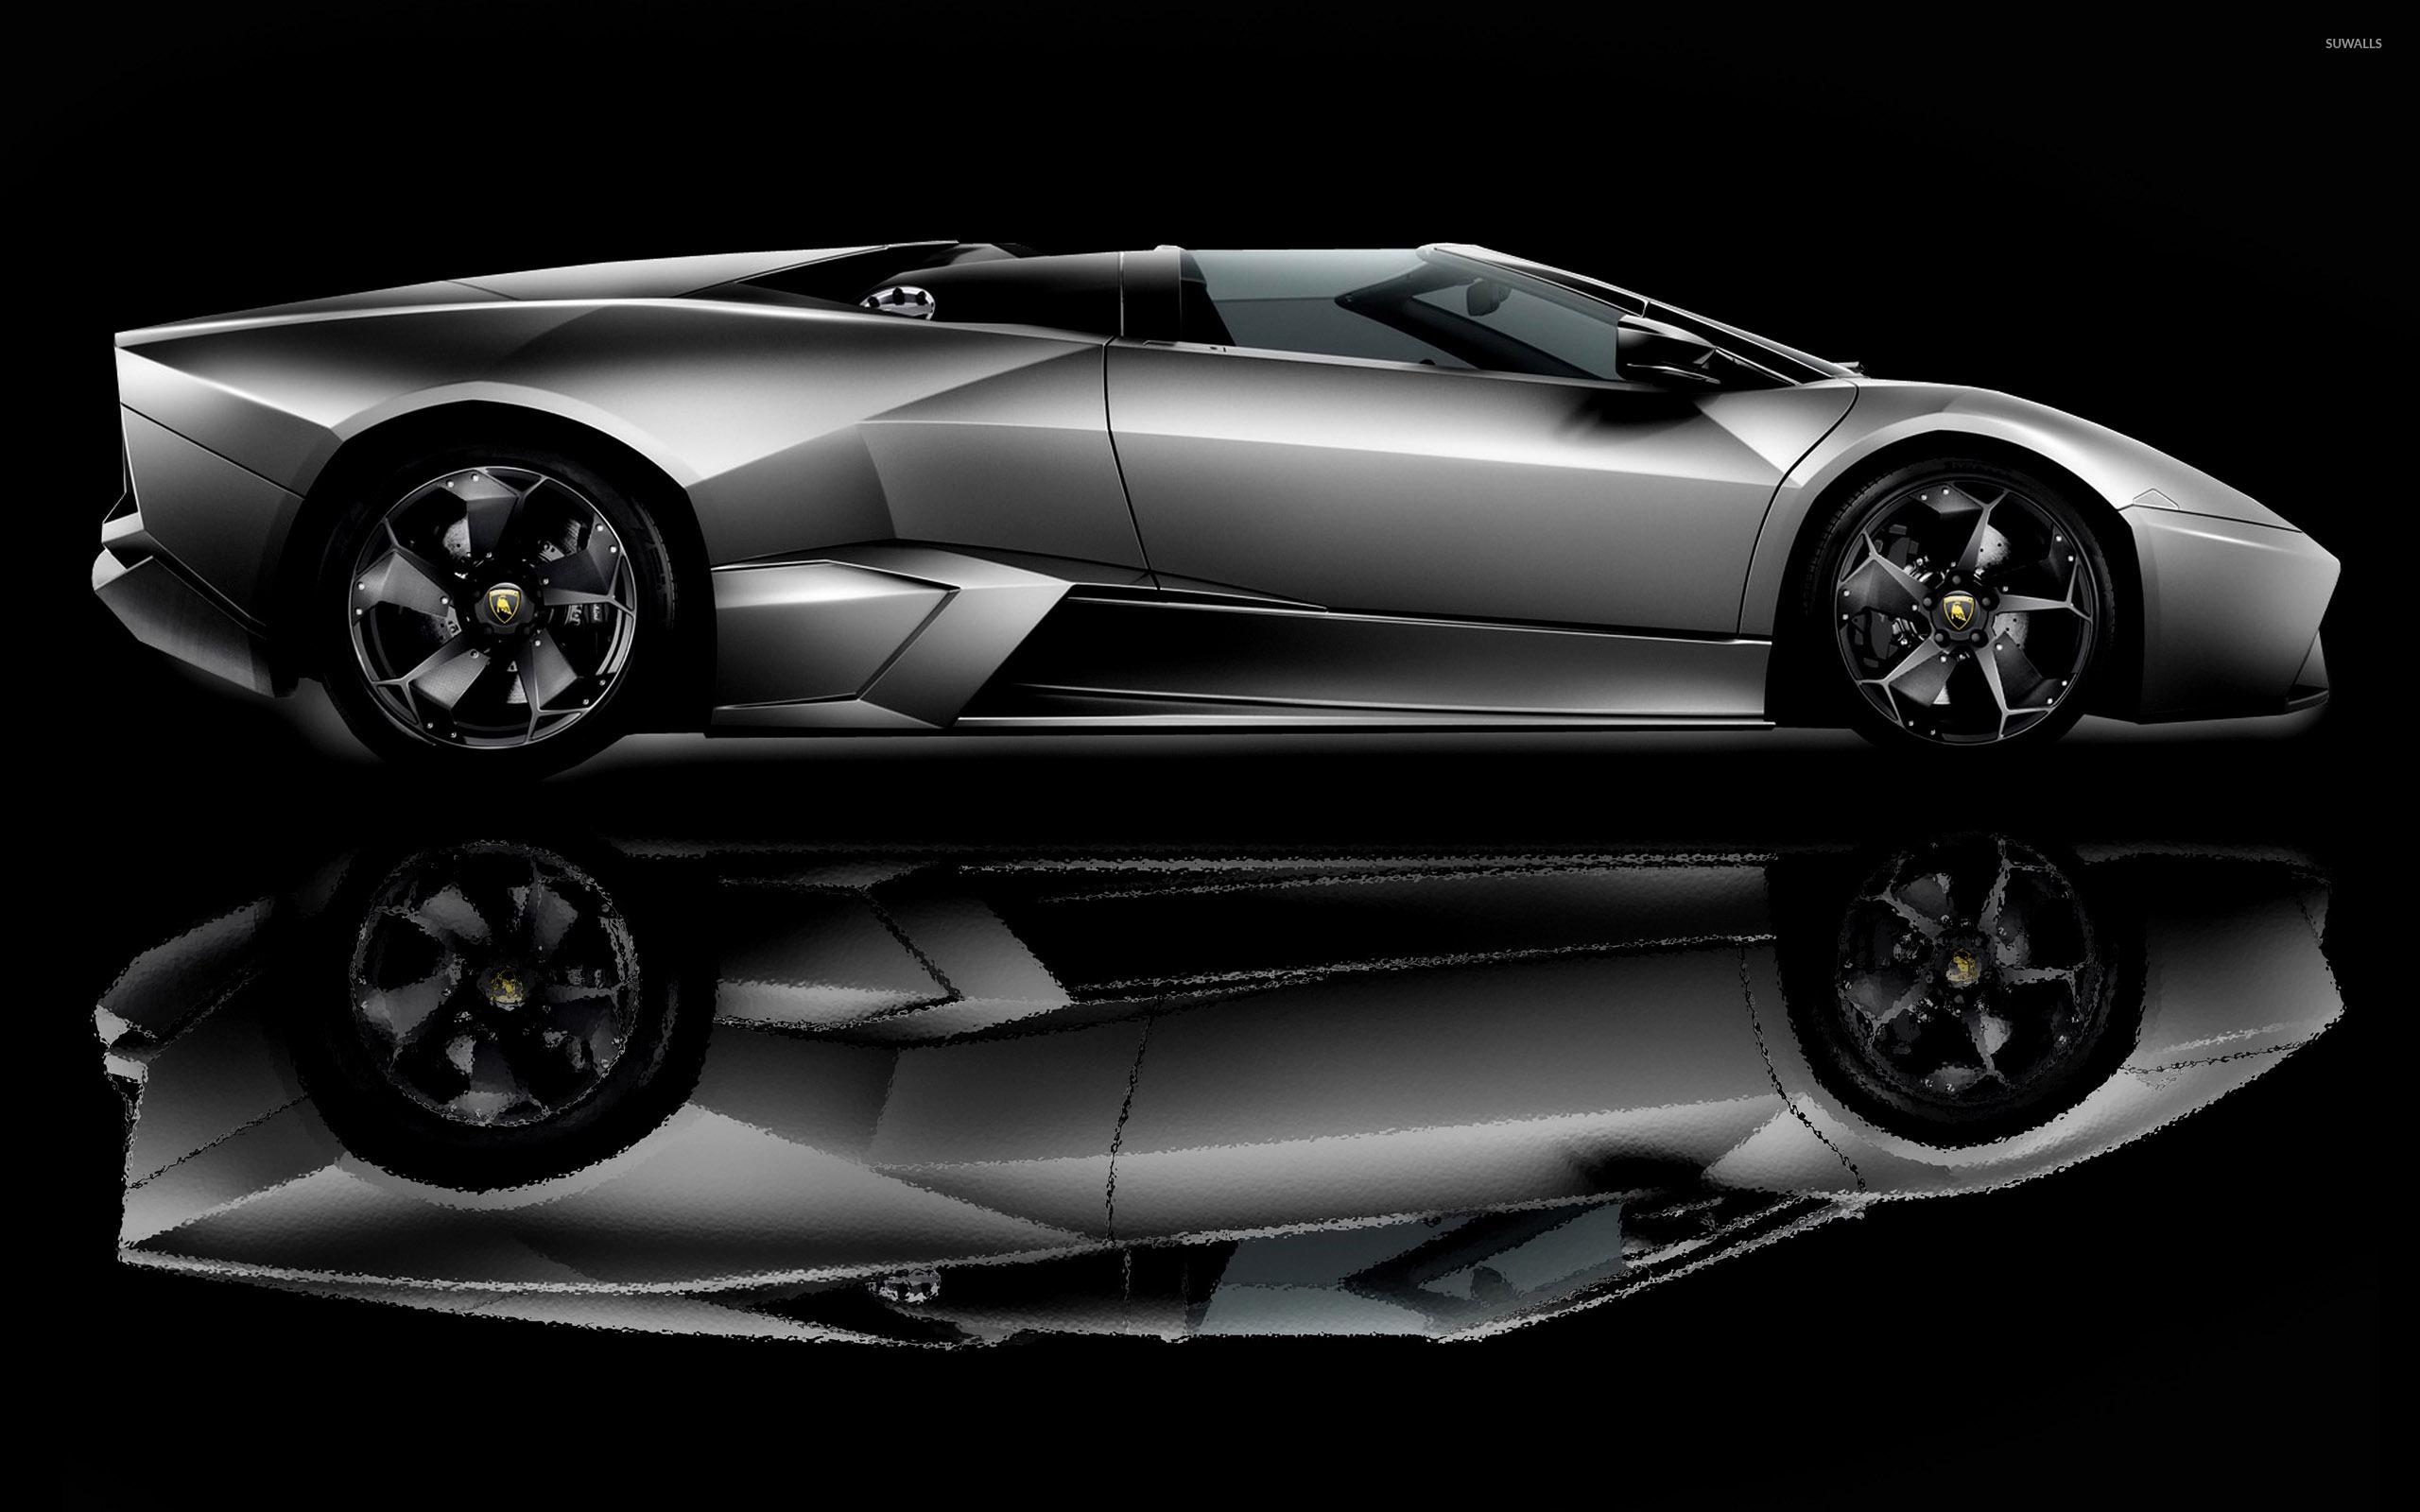 Lamborghini Reventon 6 Wallpaper Car Wallpapers 33667